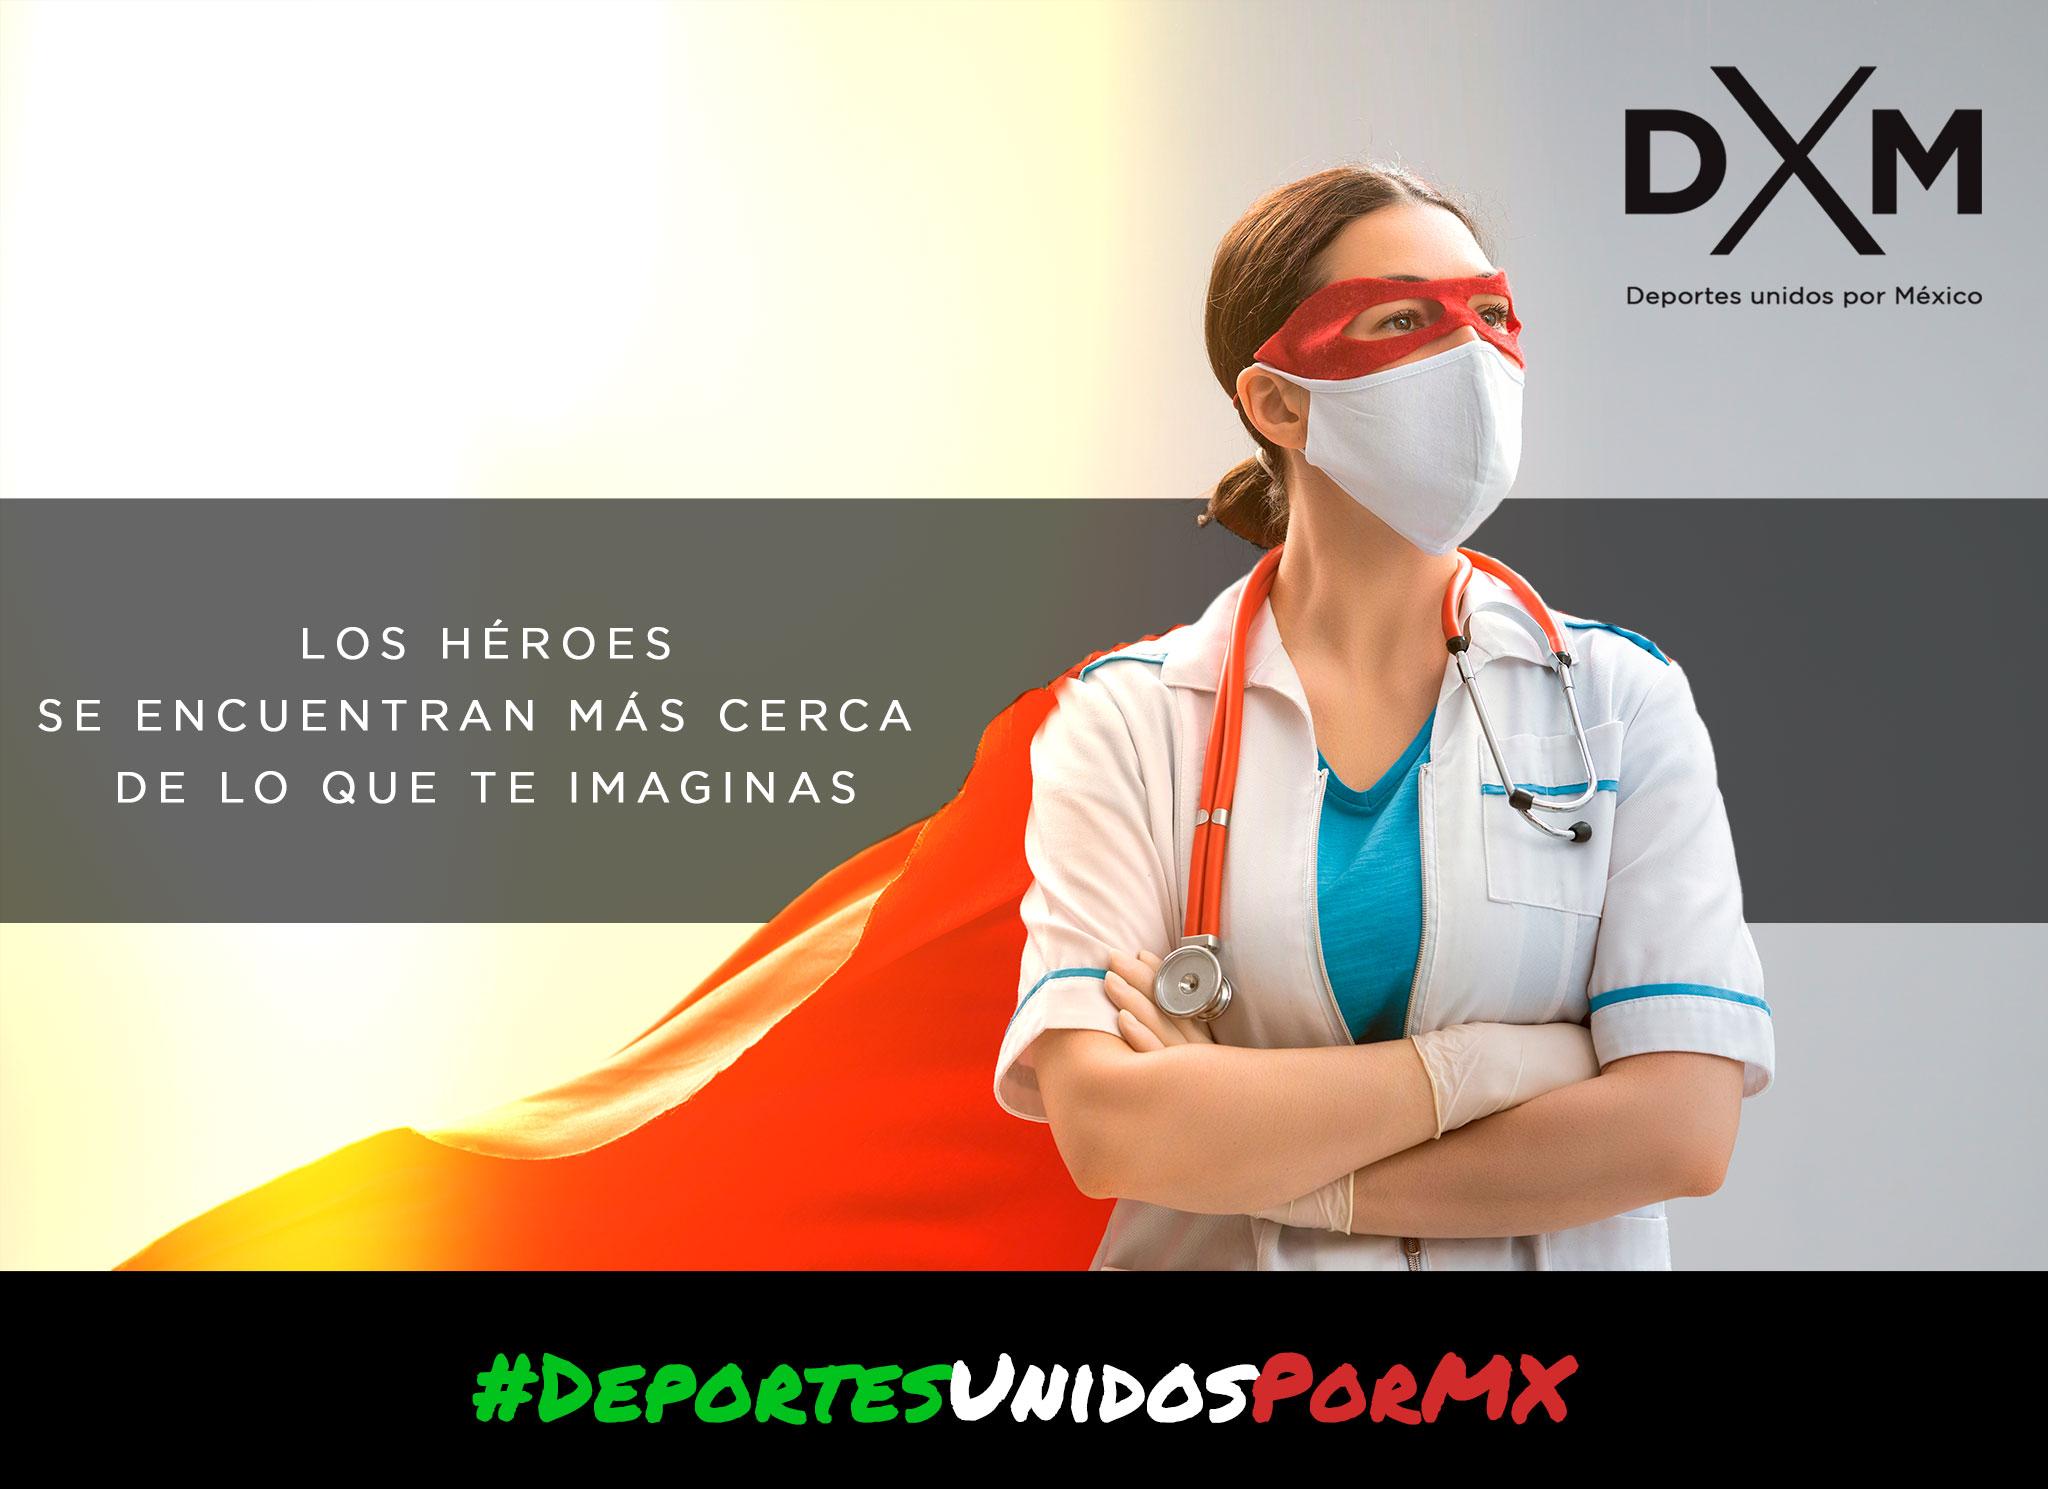 http://suljosblog.com/suljos/wp-content/uploads/2020/05/DXM-Personal-medico.jpg